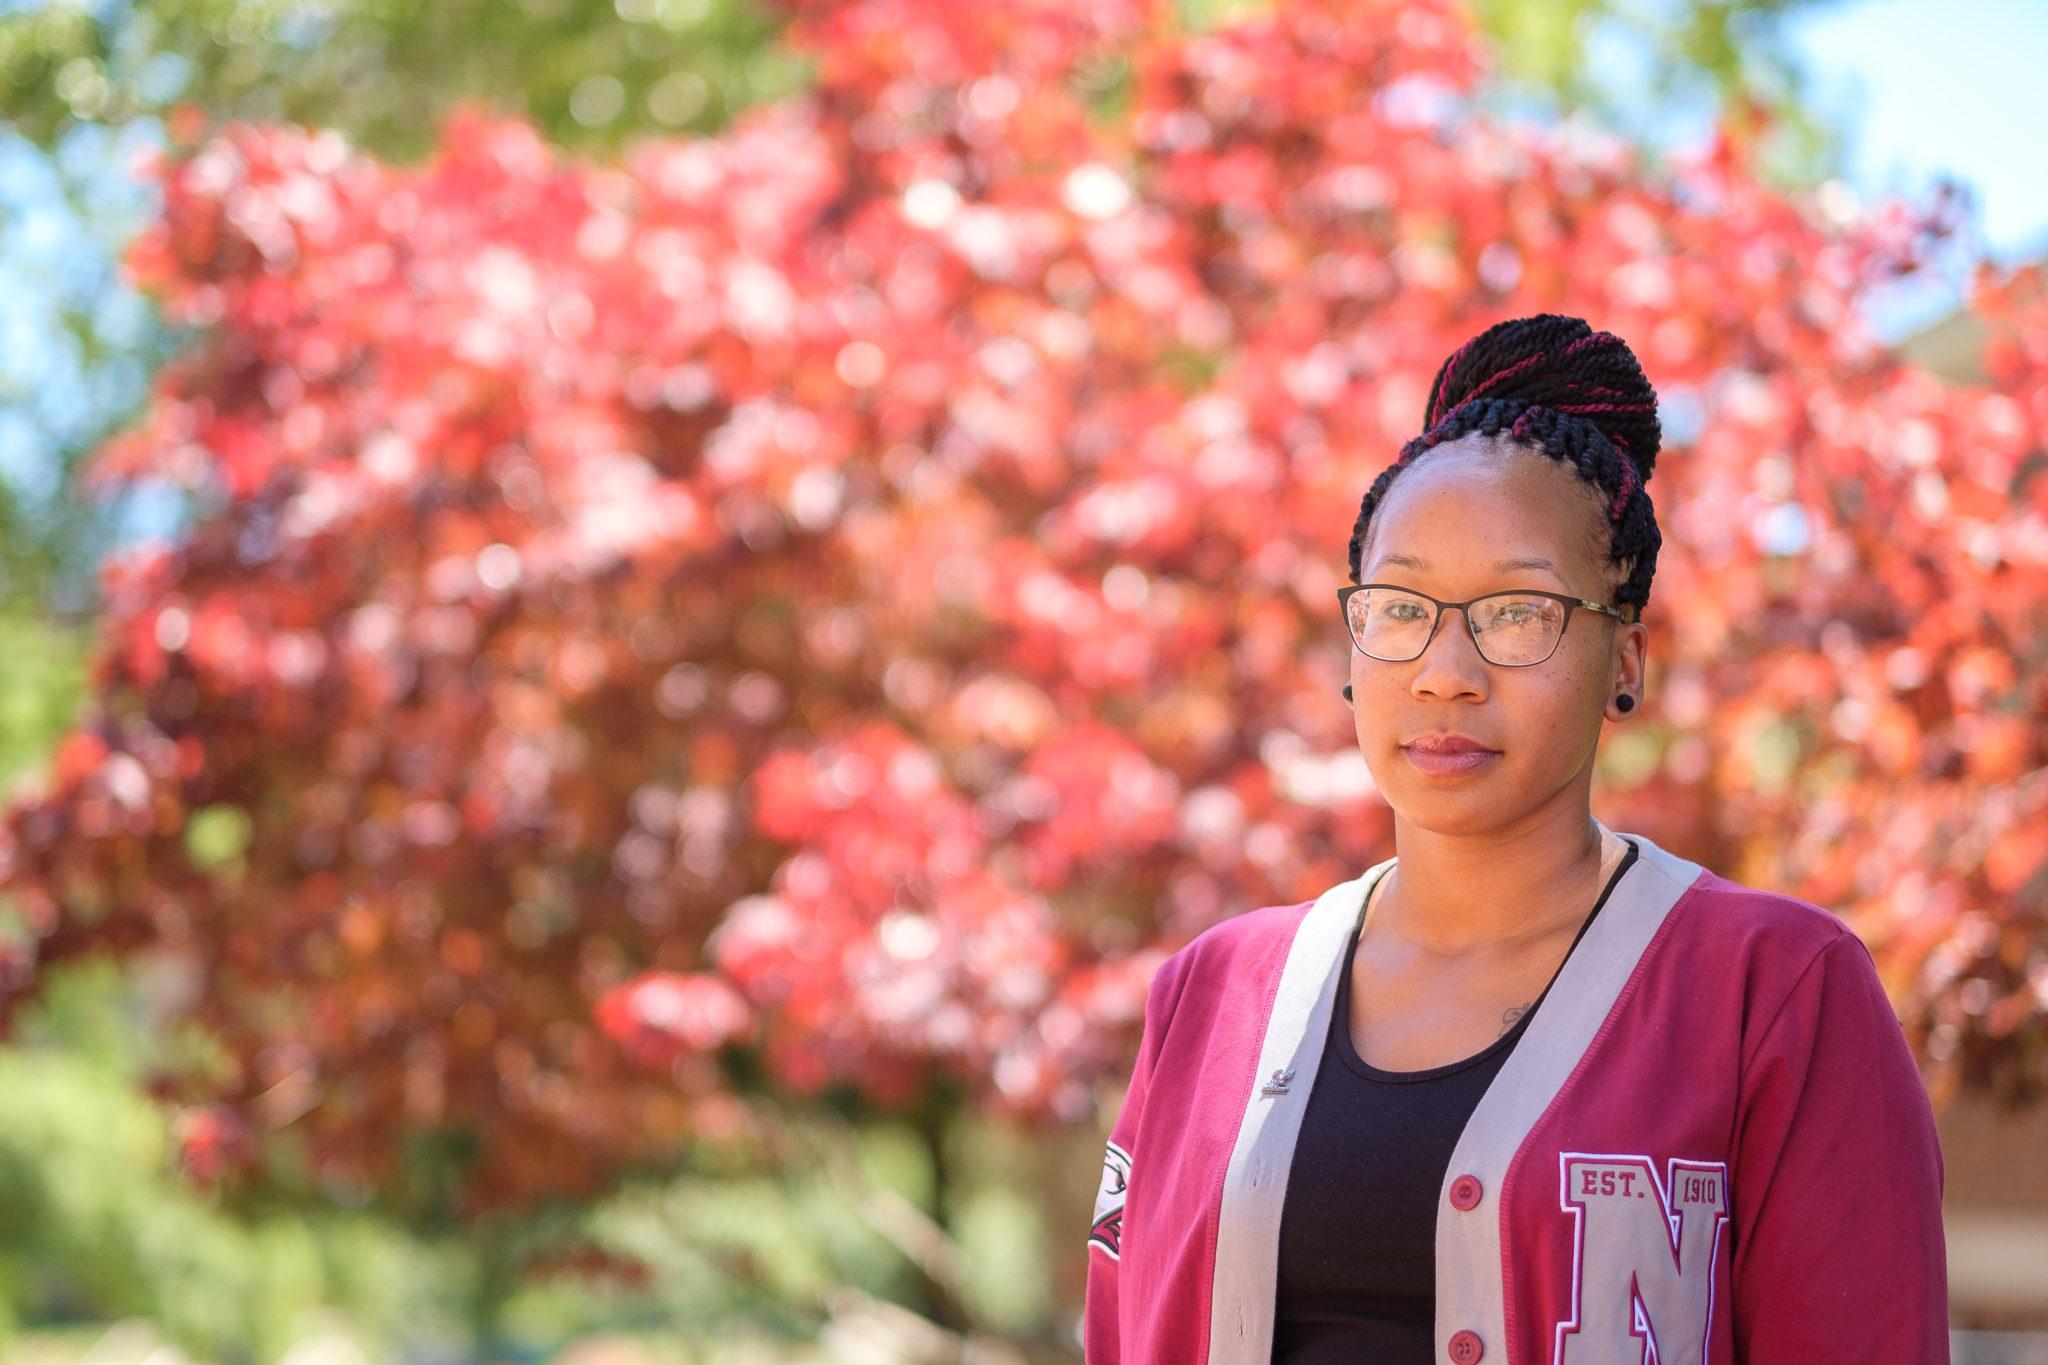 Schweitzer Fellow to Raise Awareness of Sexual Violence